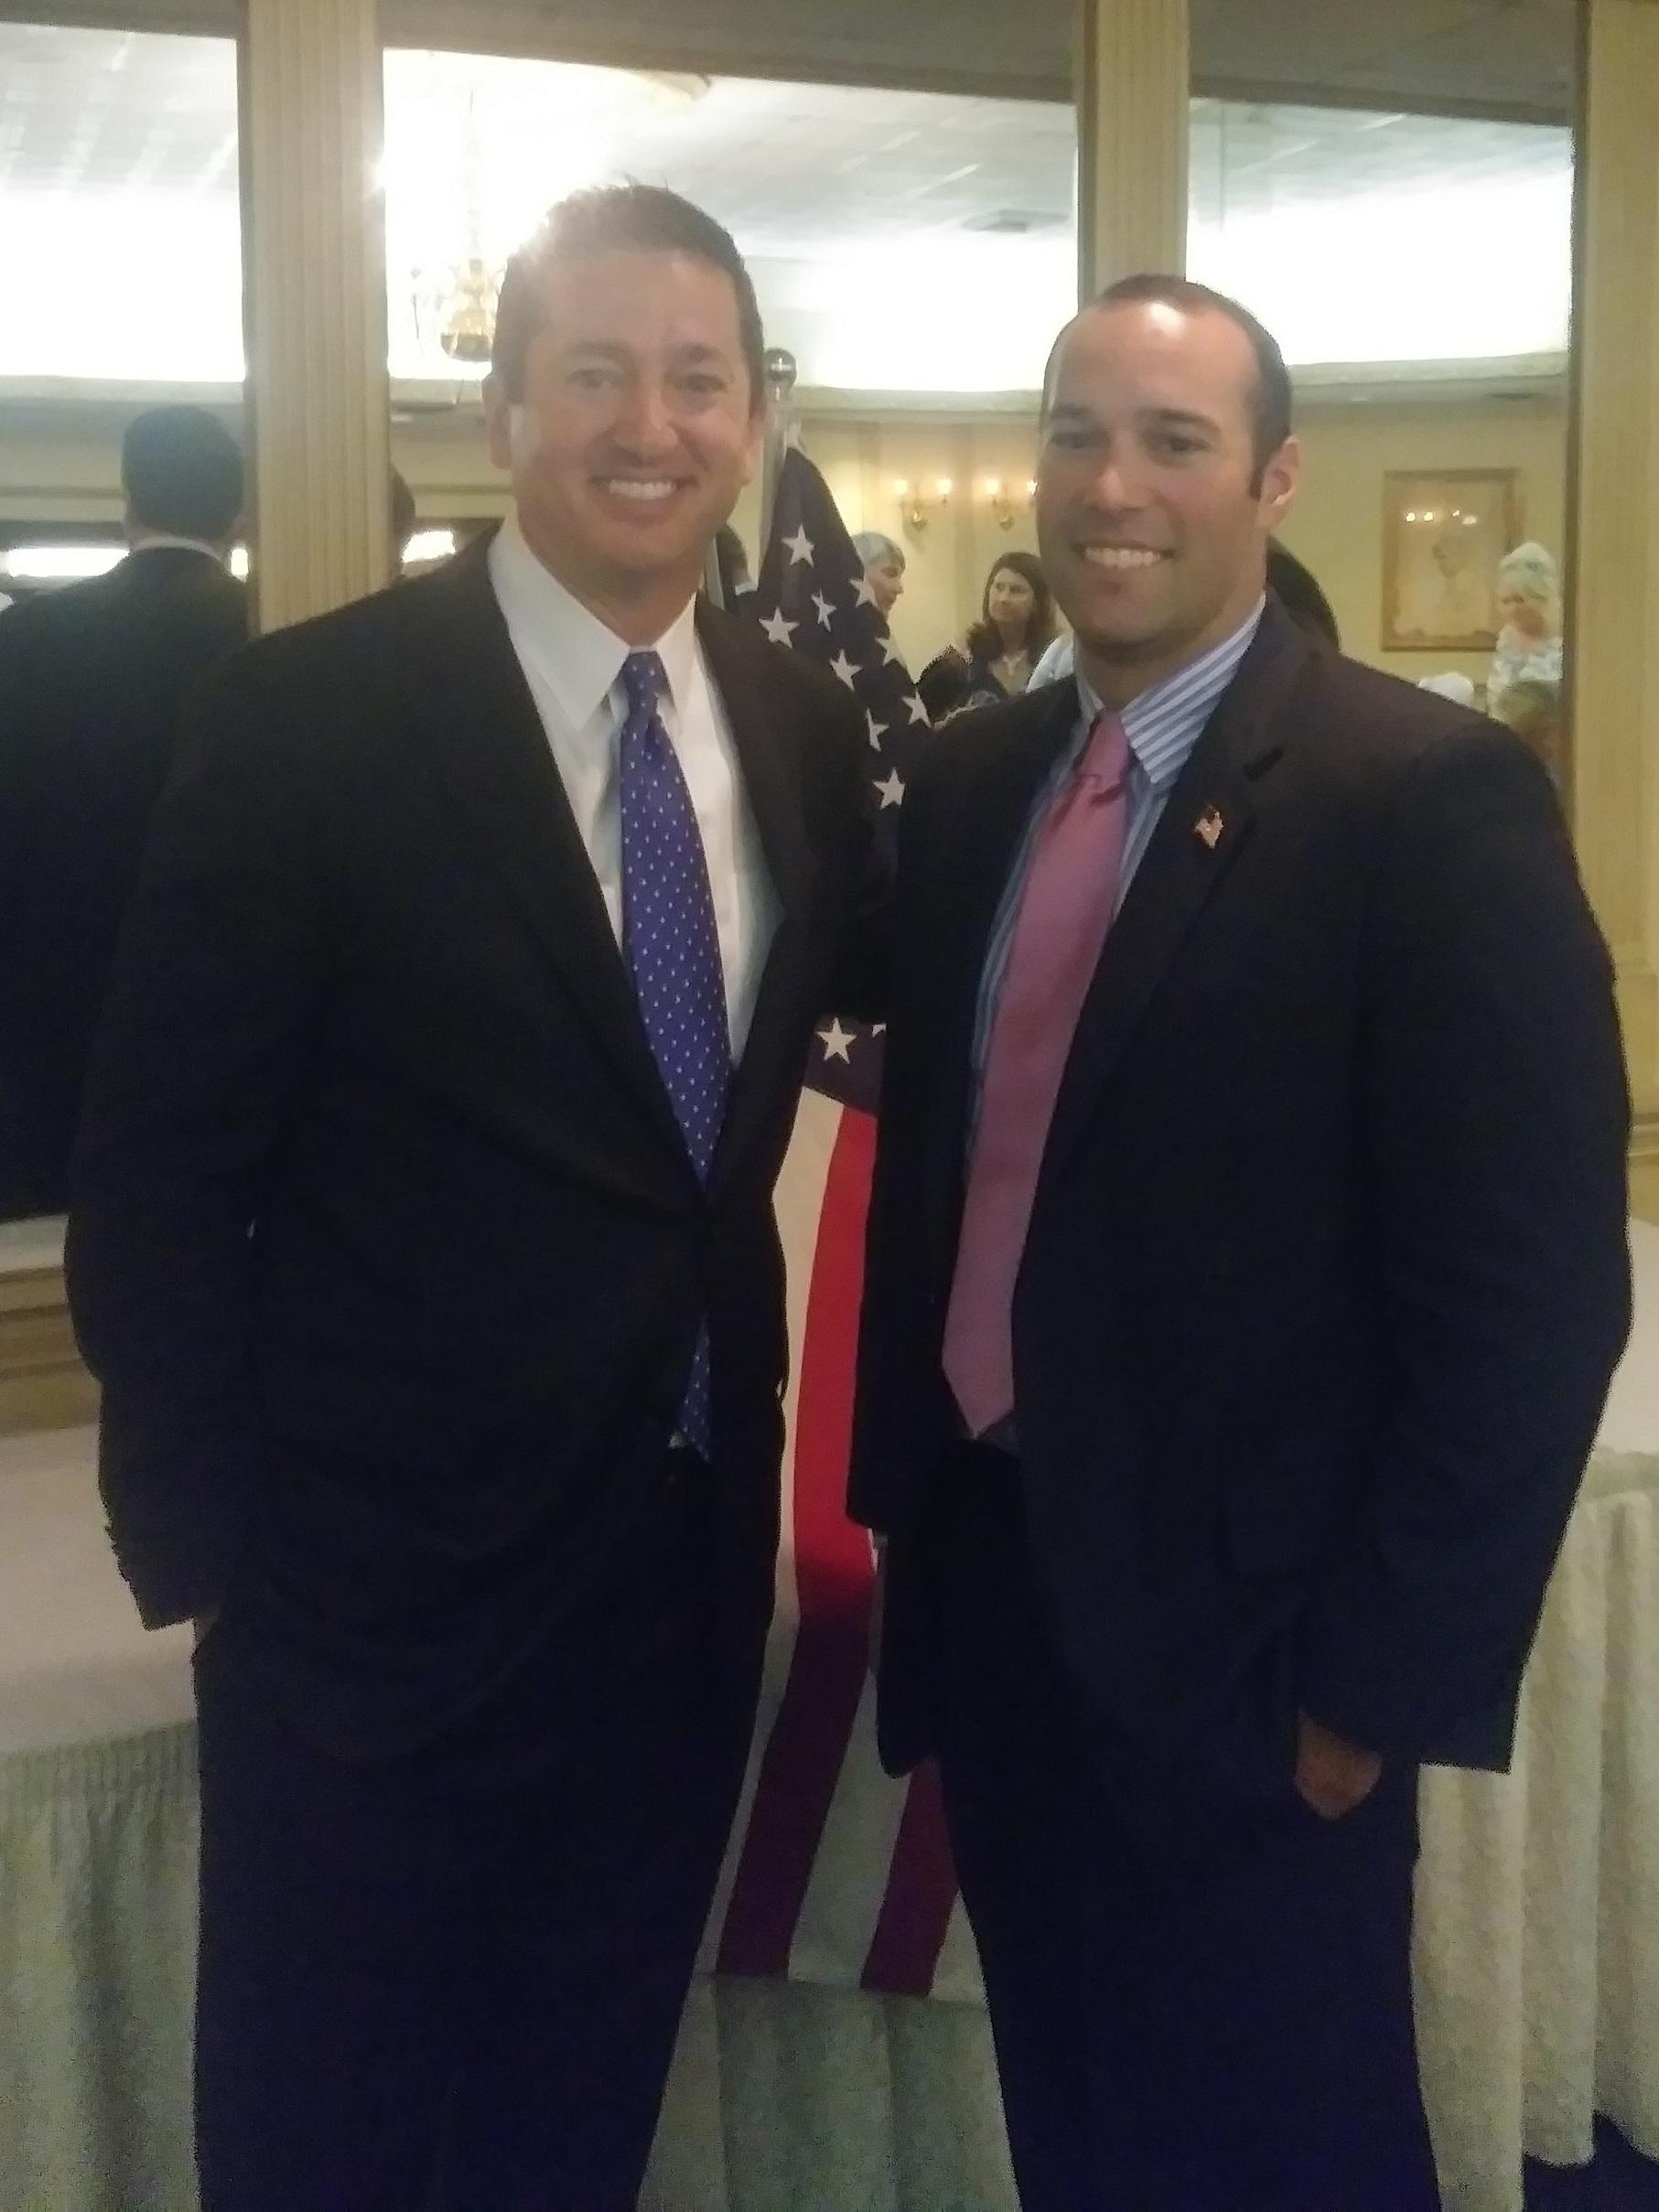 CD2 frontrunners David Richter and Brian Fitzherbert at a Salem County event